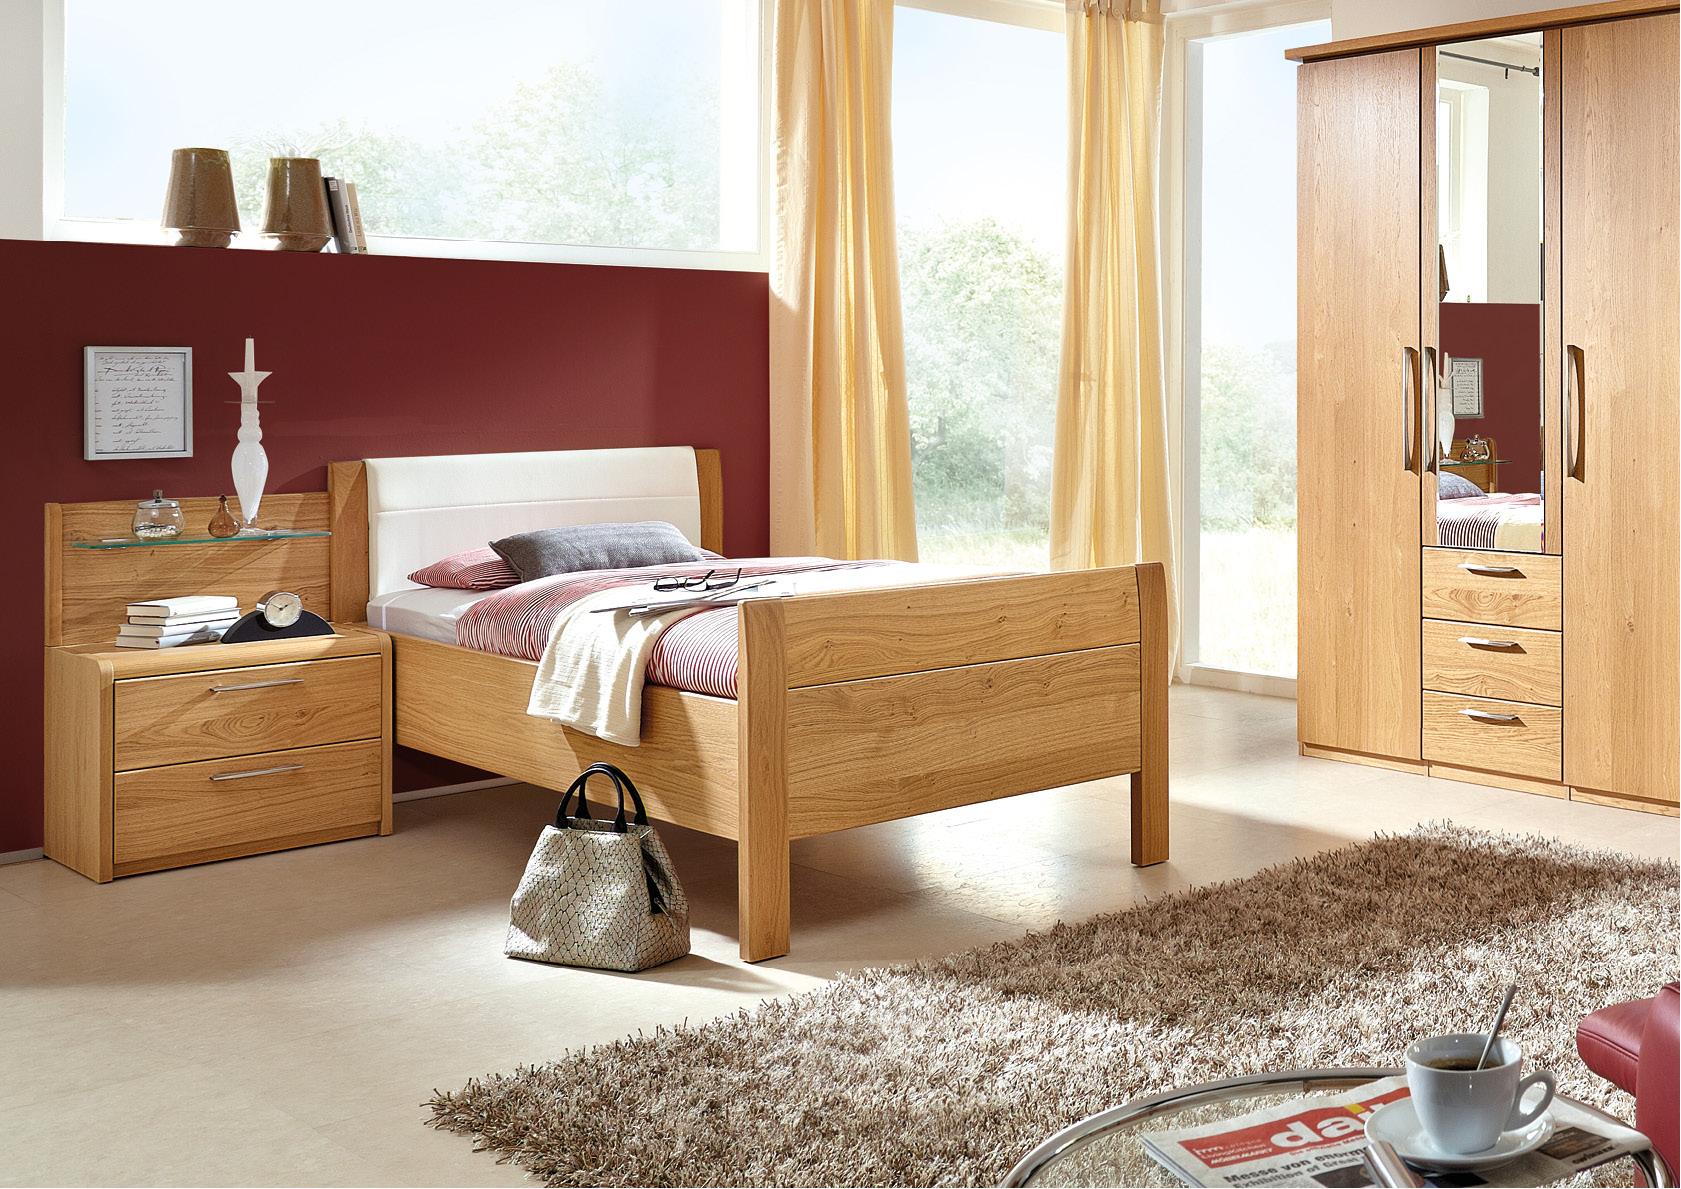 nachtschrank paris peter kling gmbh das bettenhaus m bel kling in pirmasens. Black Bedroom Furniture Sets. Home Design Ideas